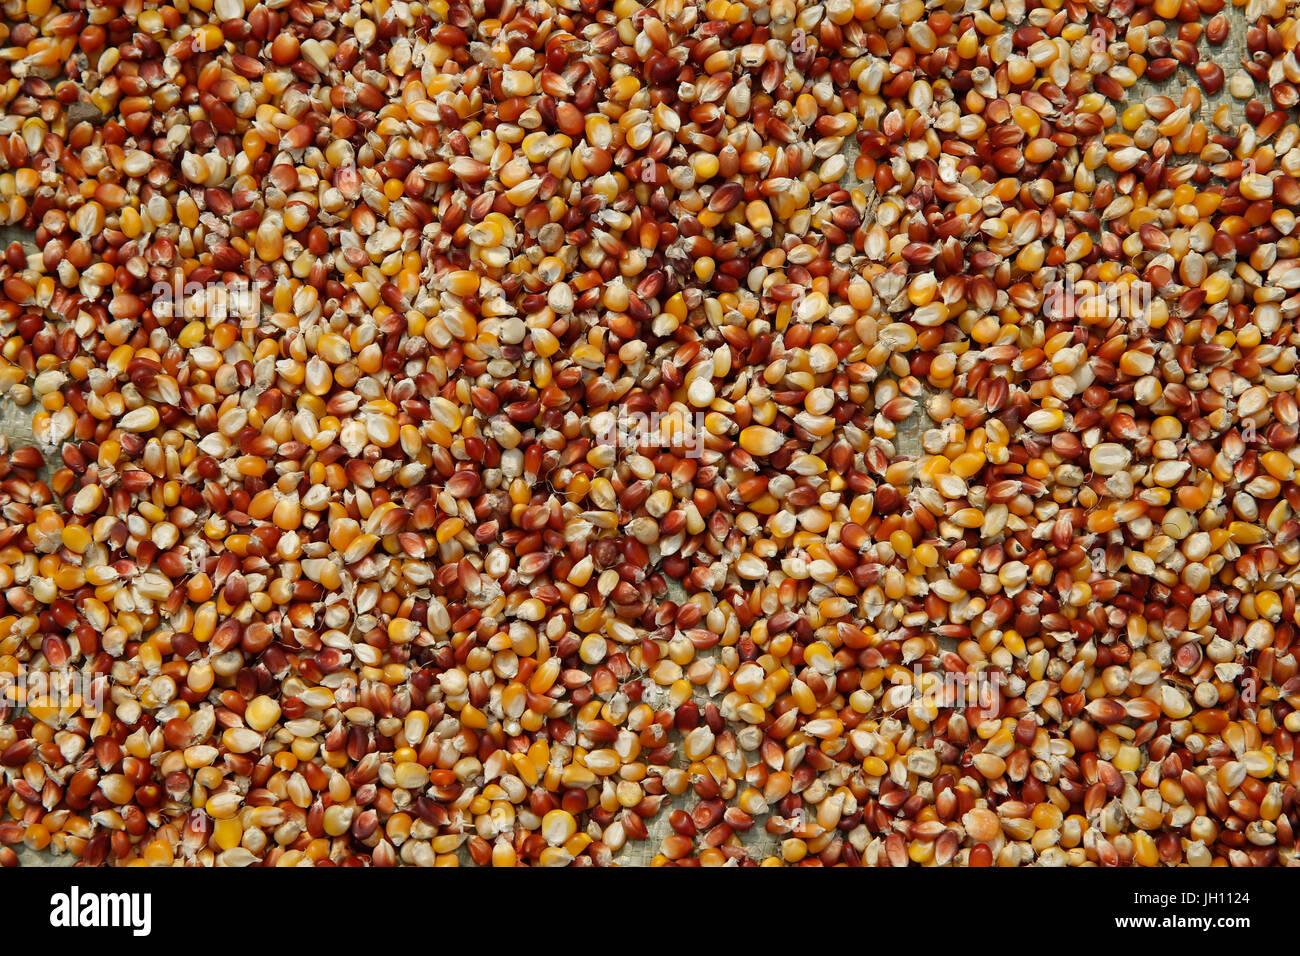 Corn. Uganda. - Stock Image